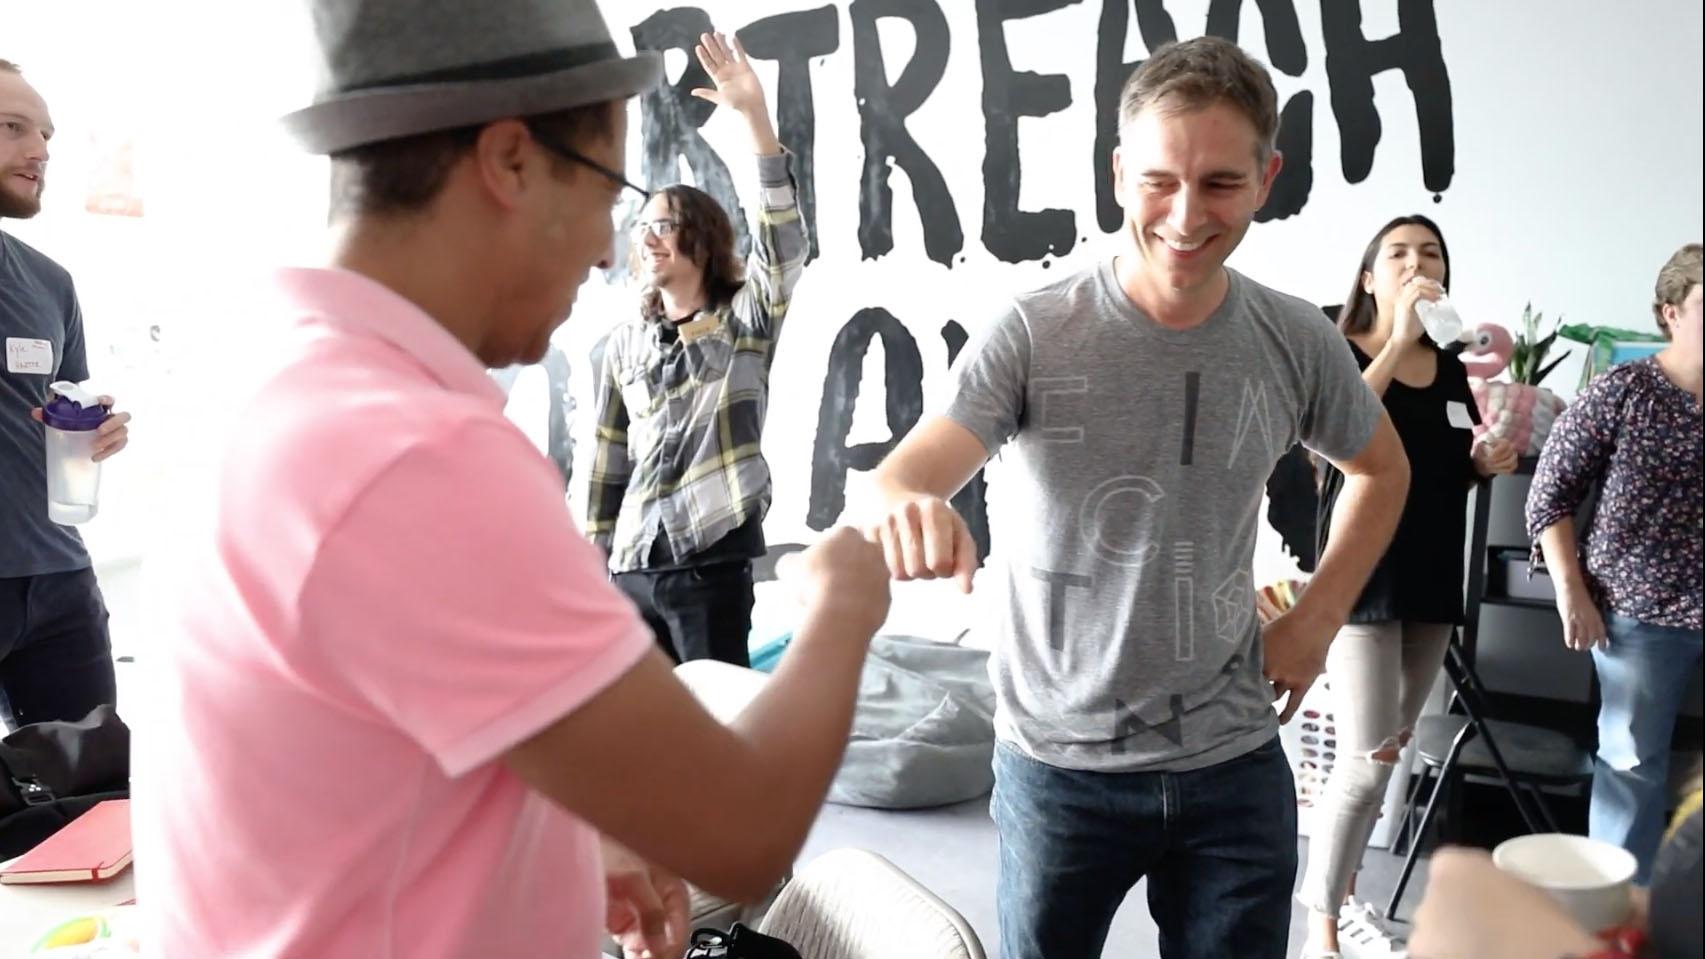 Two workshop participants fist bumping